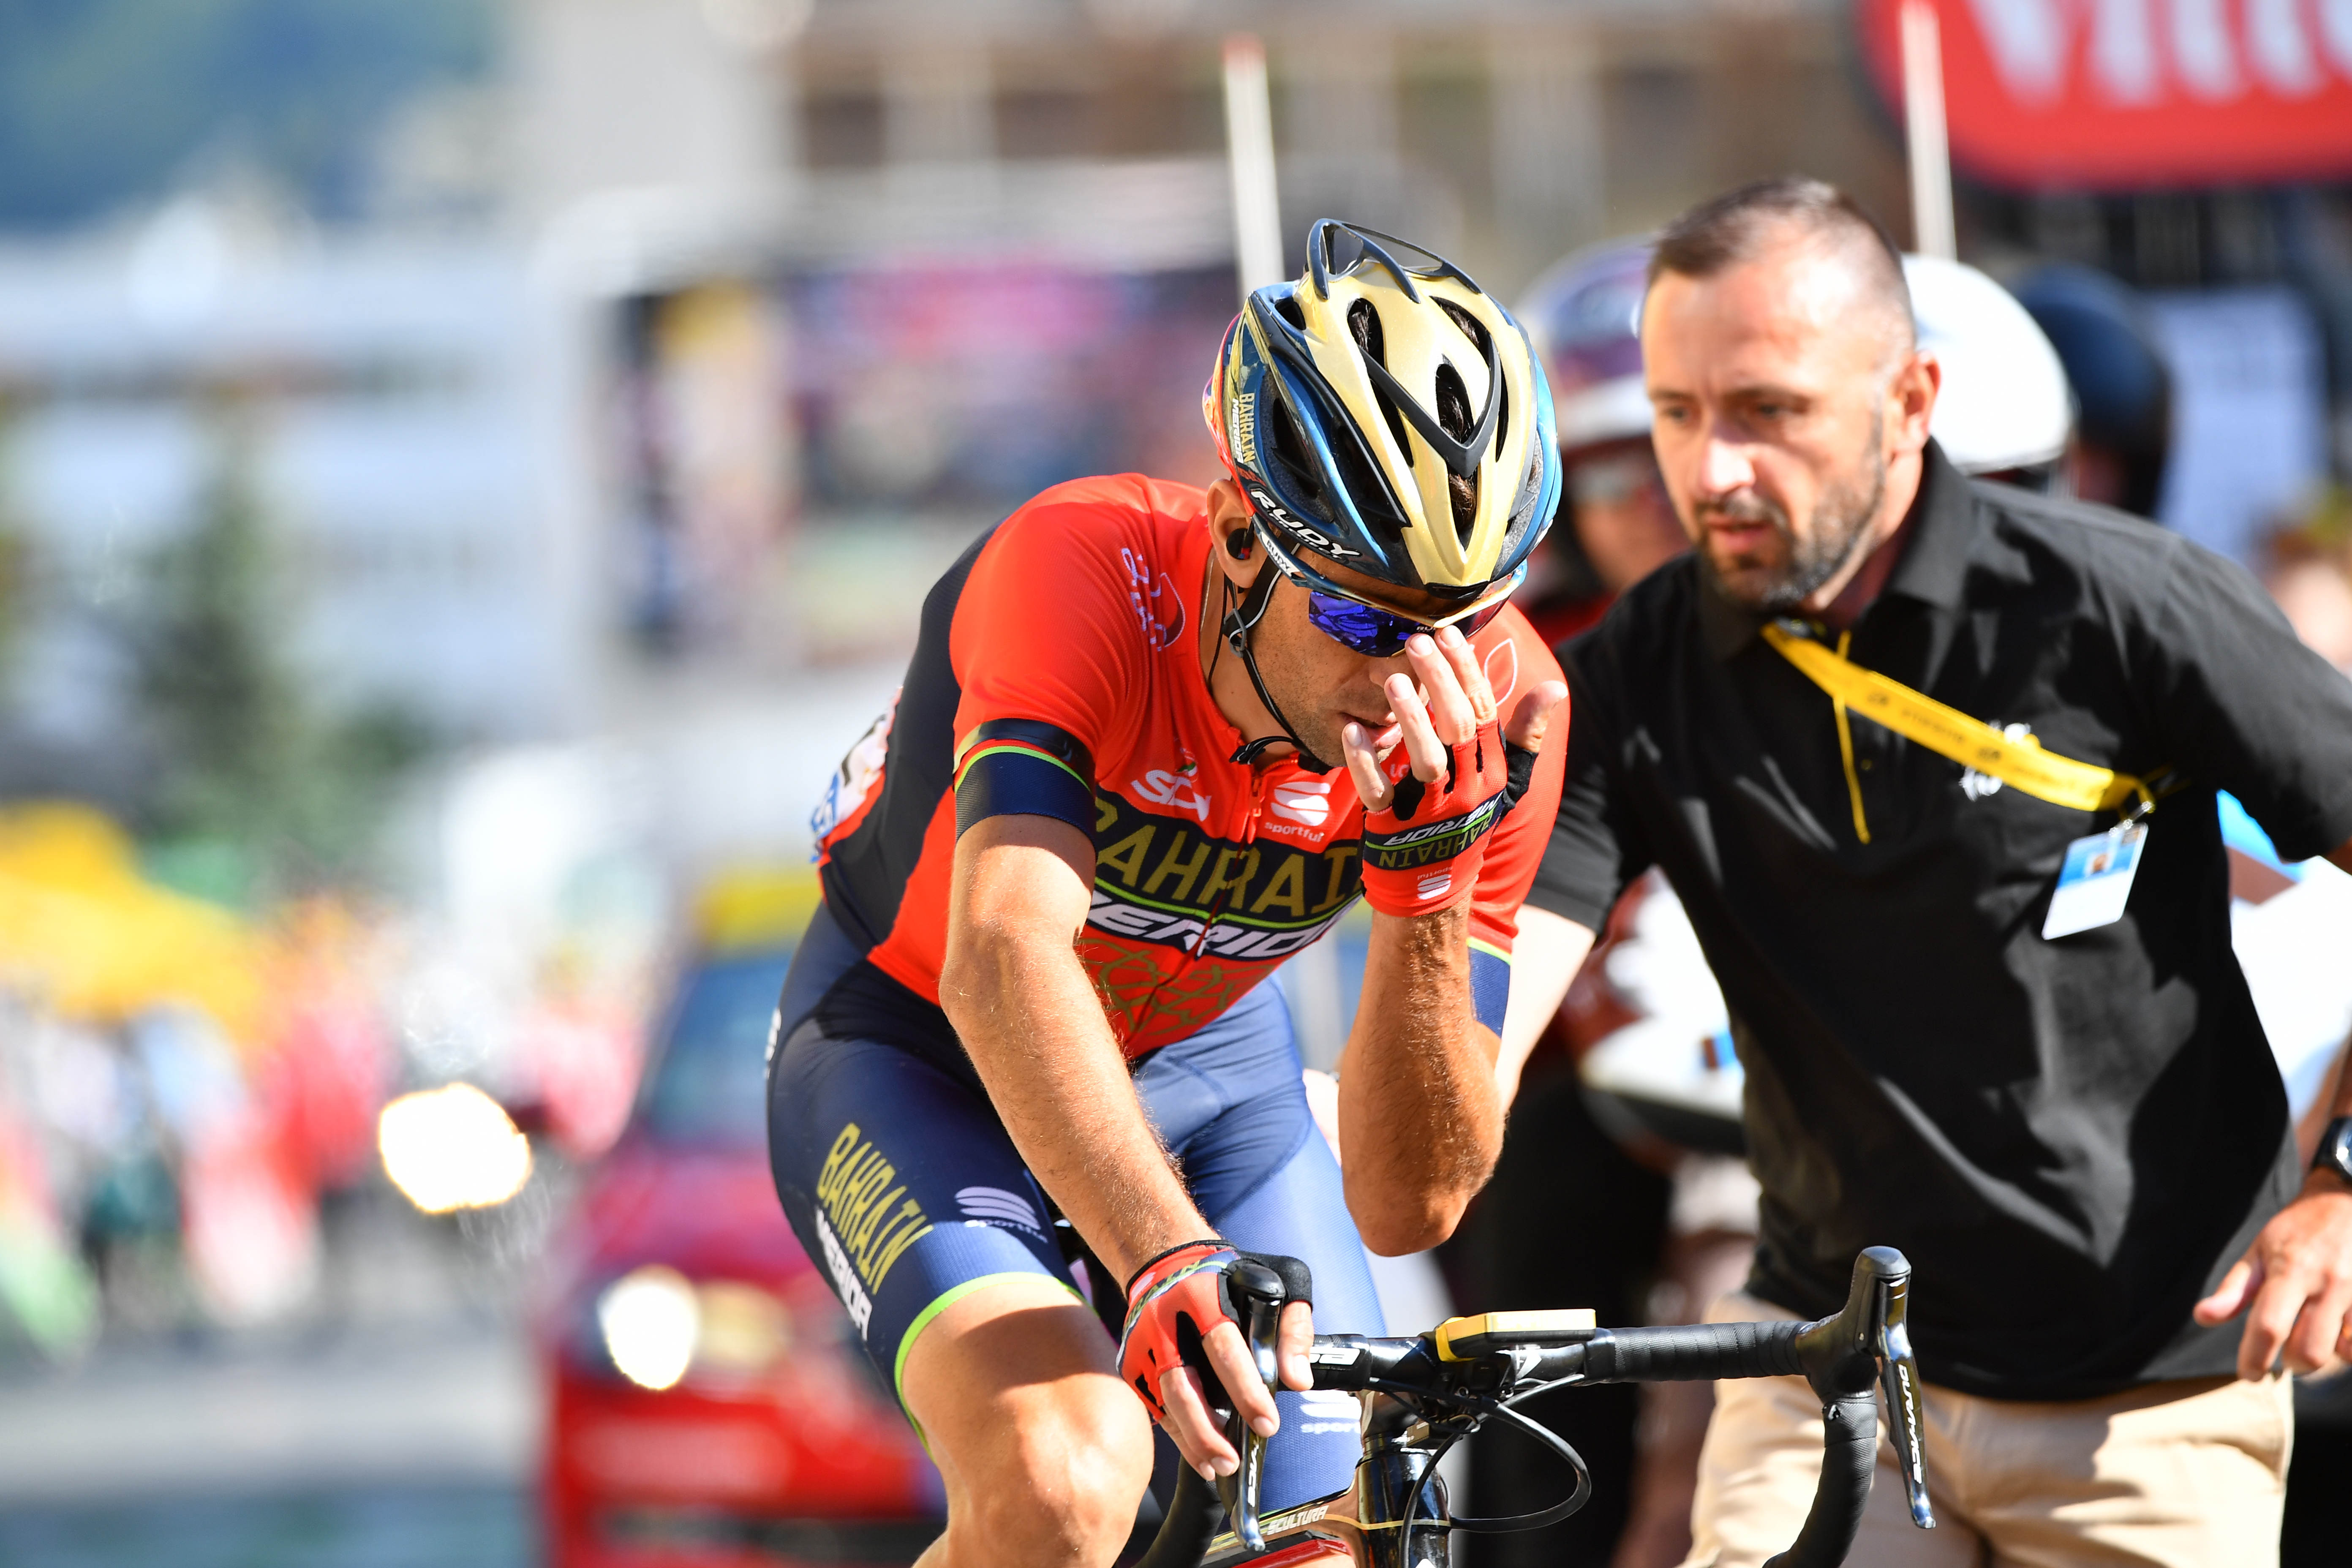 Vincenzo Nibali: Triurno zaslišanje glede padca na Touru